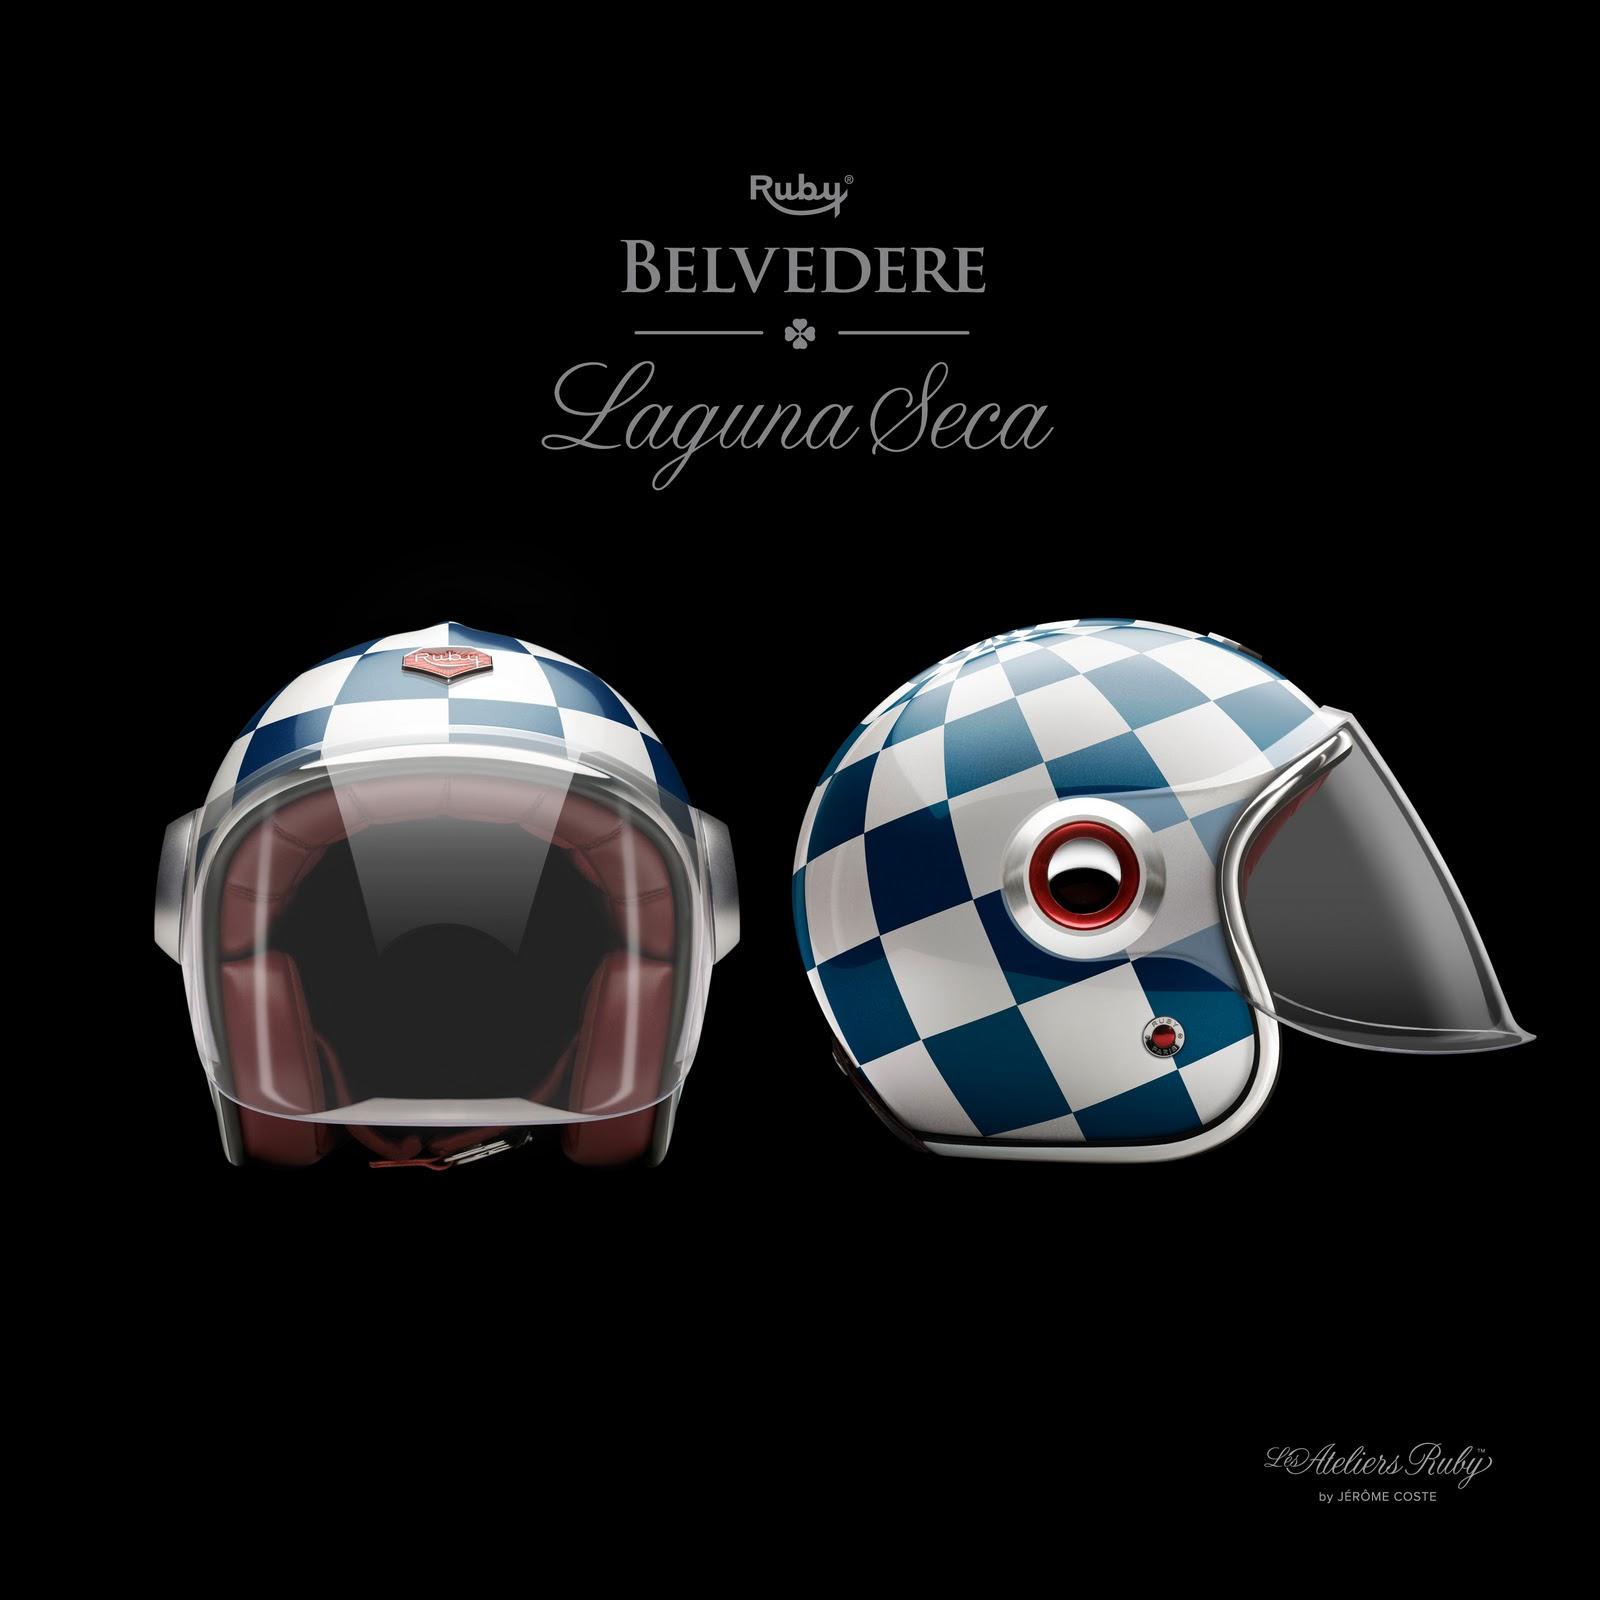 Commander son casque de moto vintage sur internet